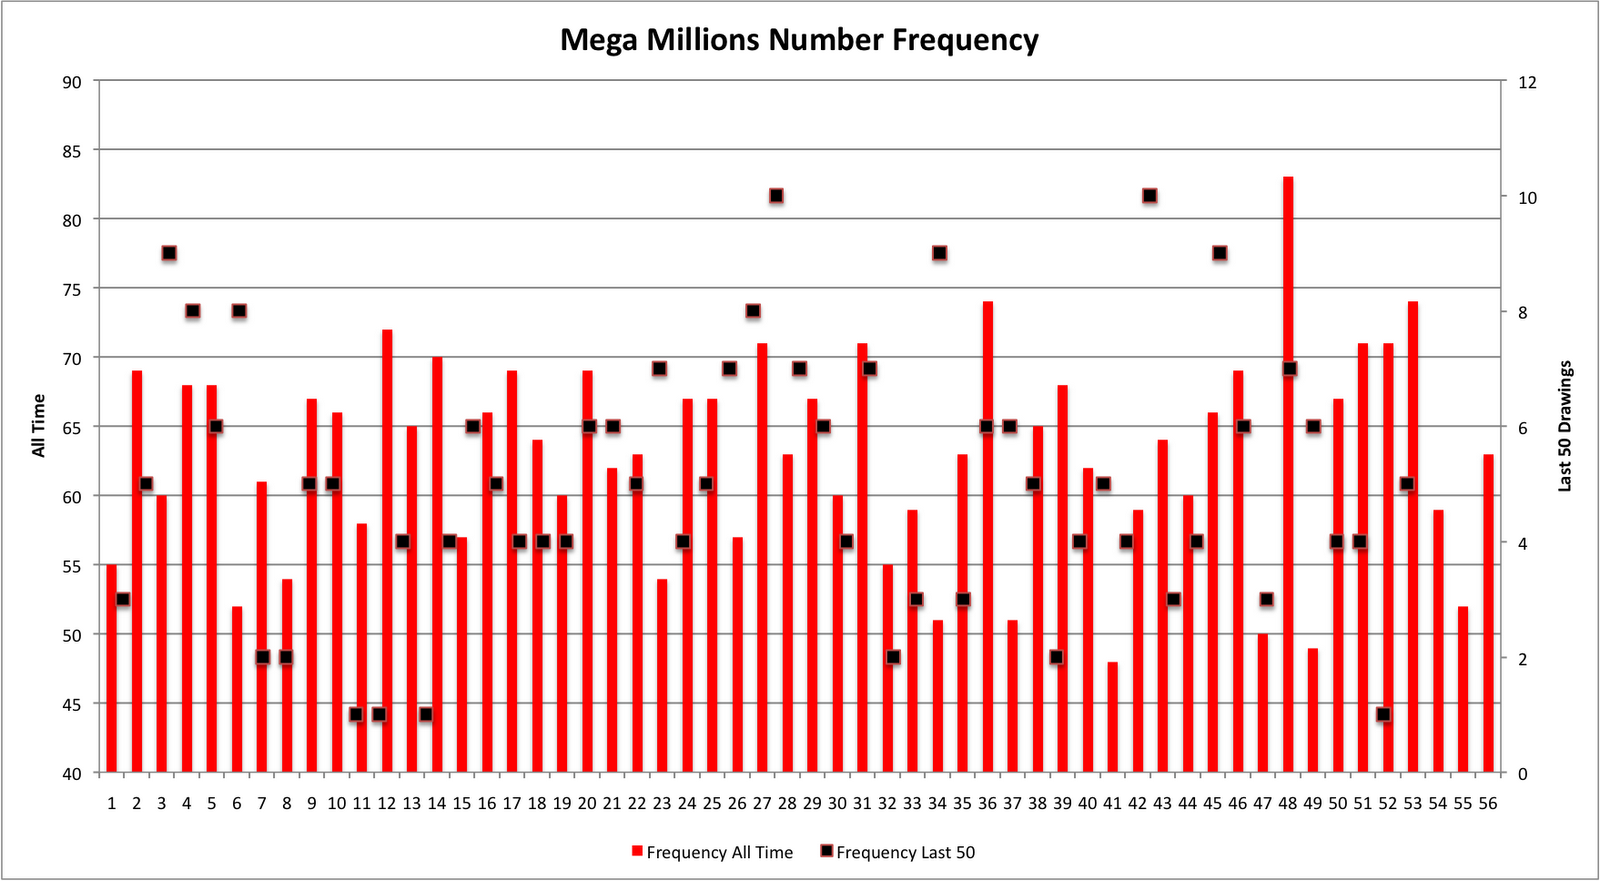 Arkiv lotteri megamilliony for 2019 år